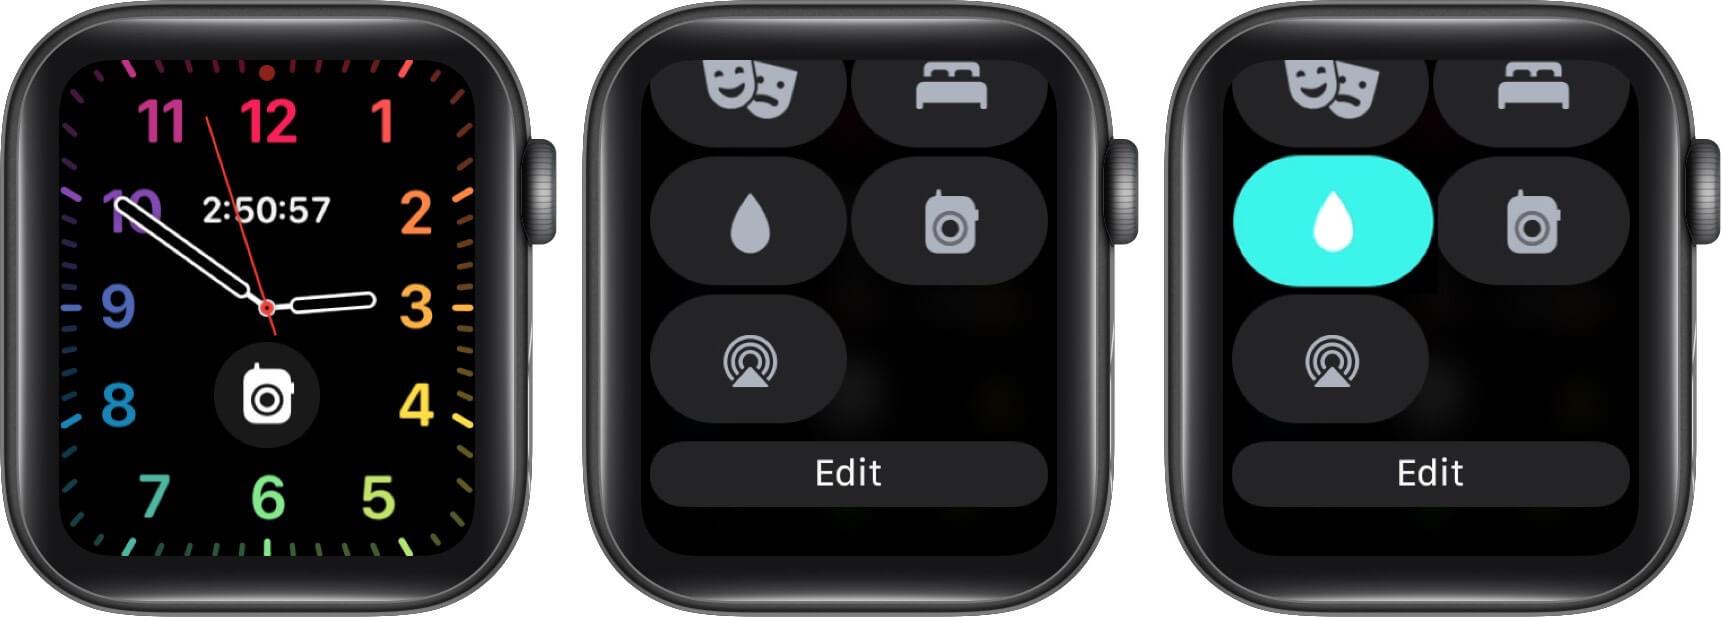 turn on water lock on apple watch